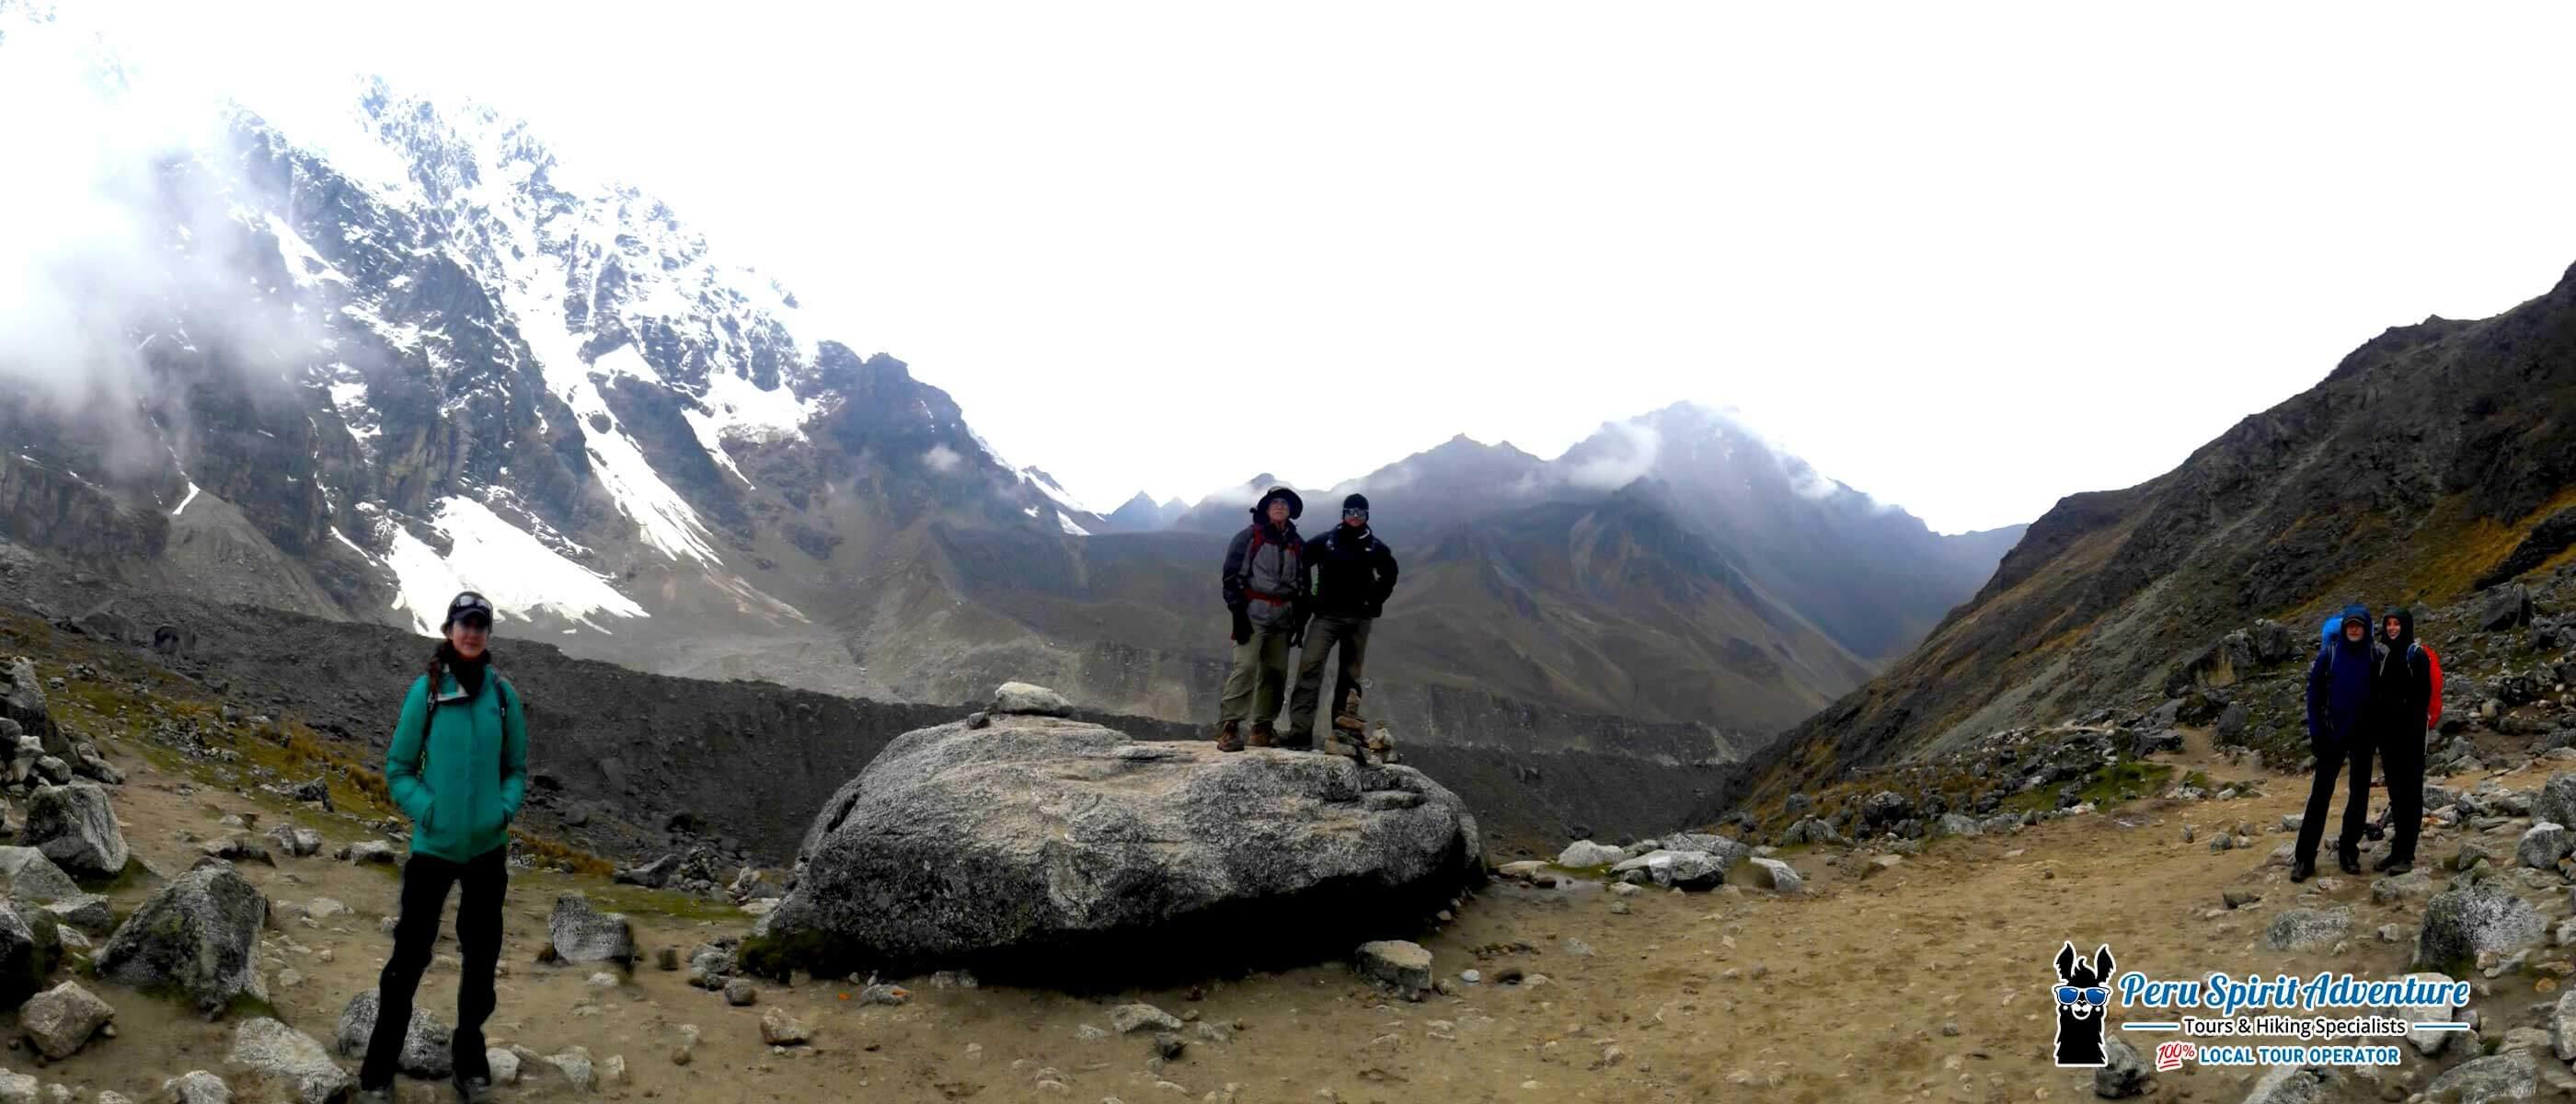 3-days salkantay challenge trek to Machu Picchu